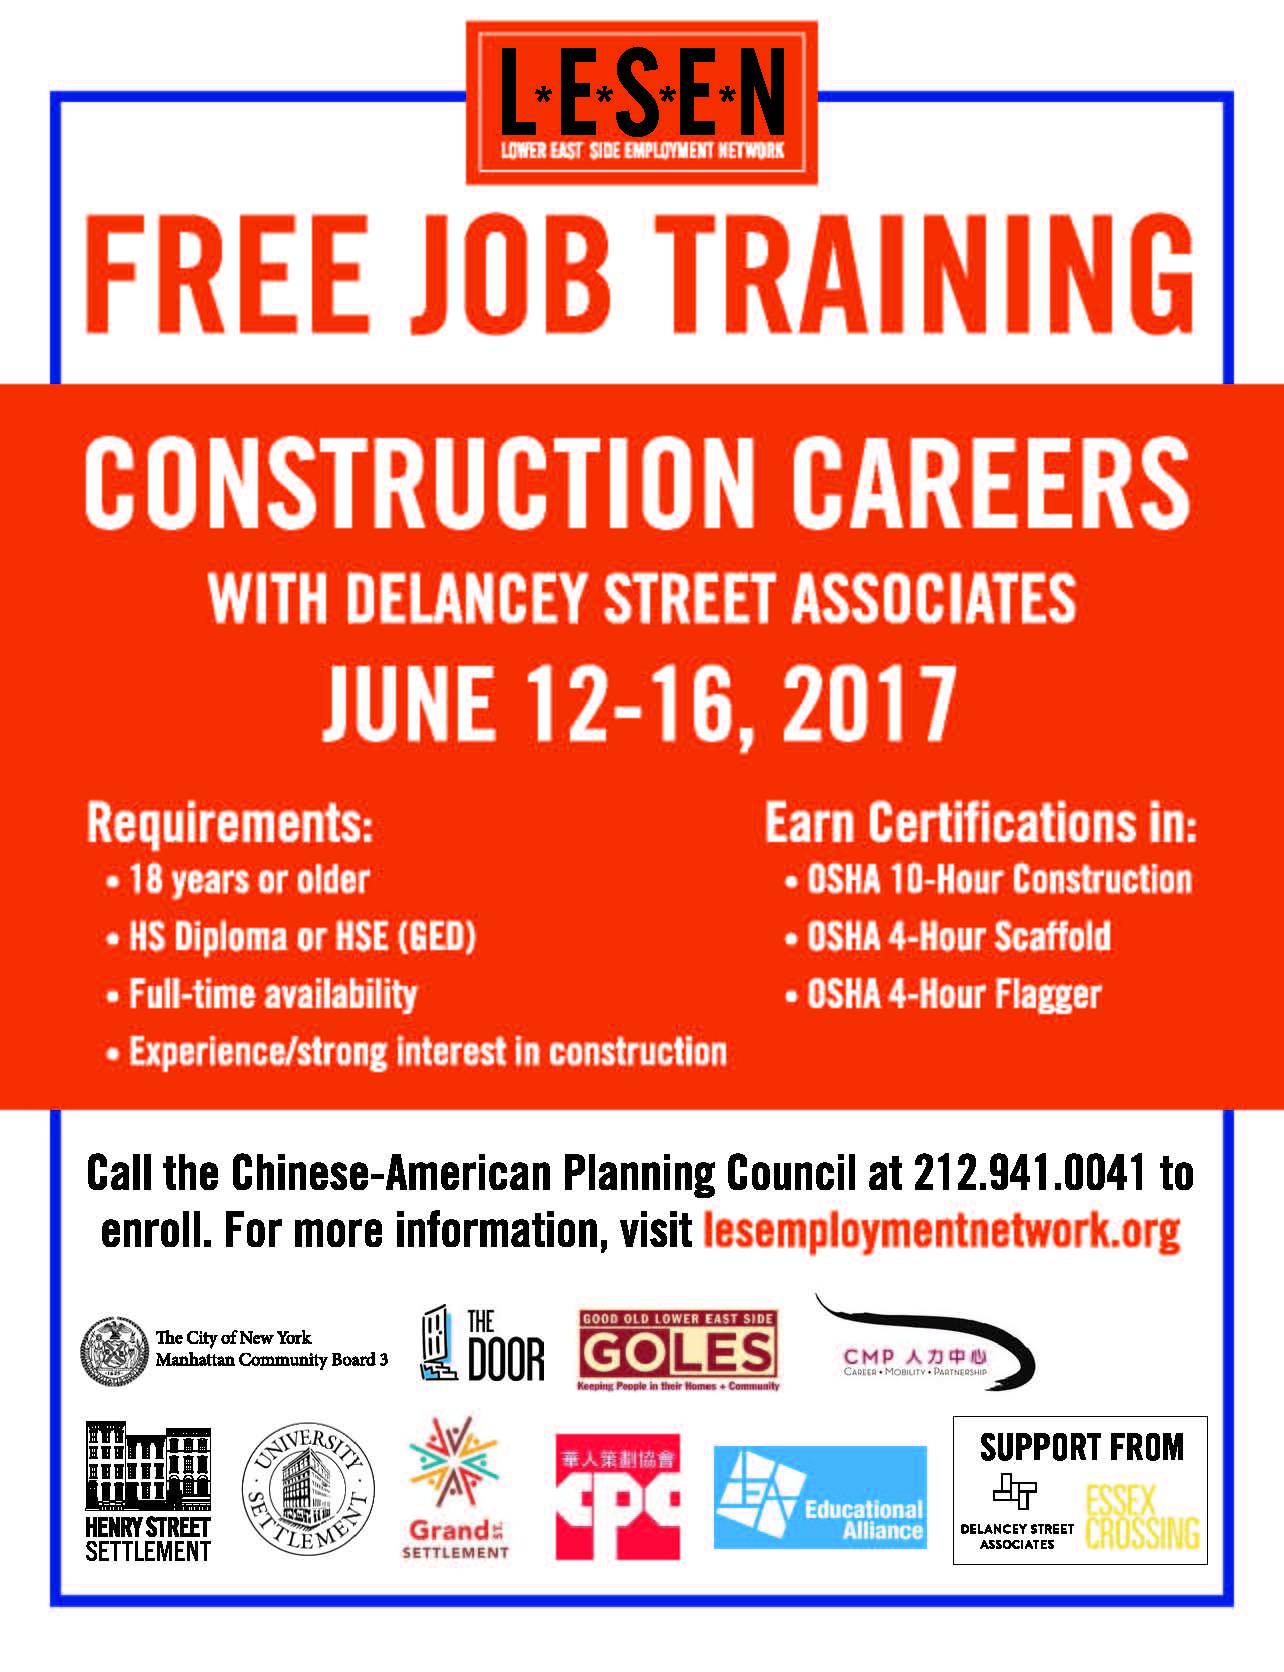 DSA-LESEN Construction Certifications Training Recruitment Event